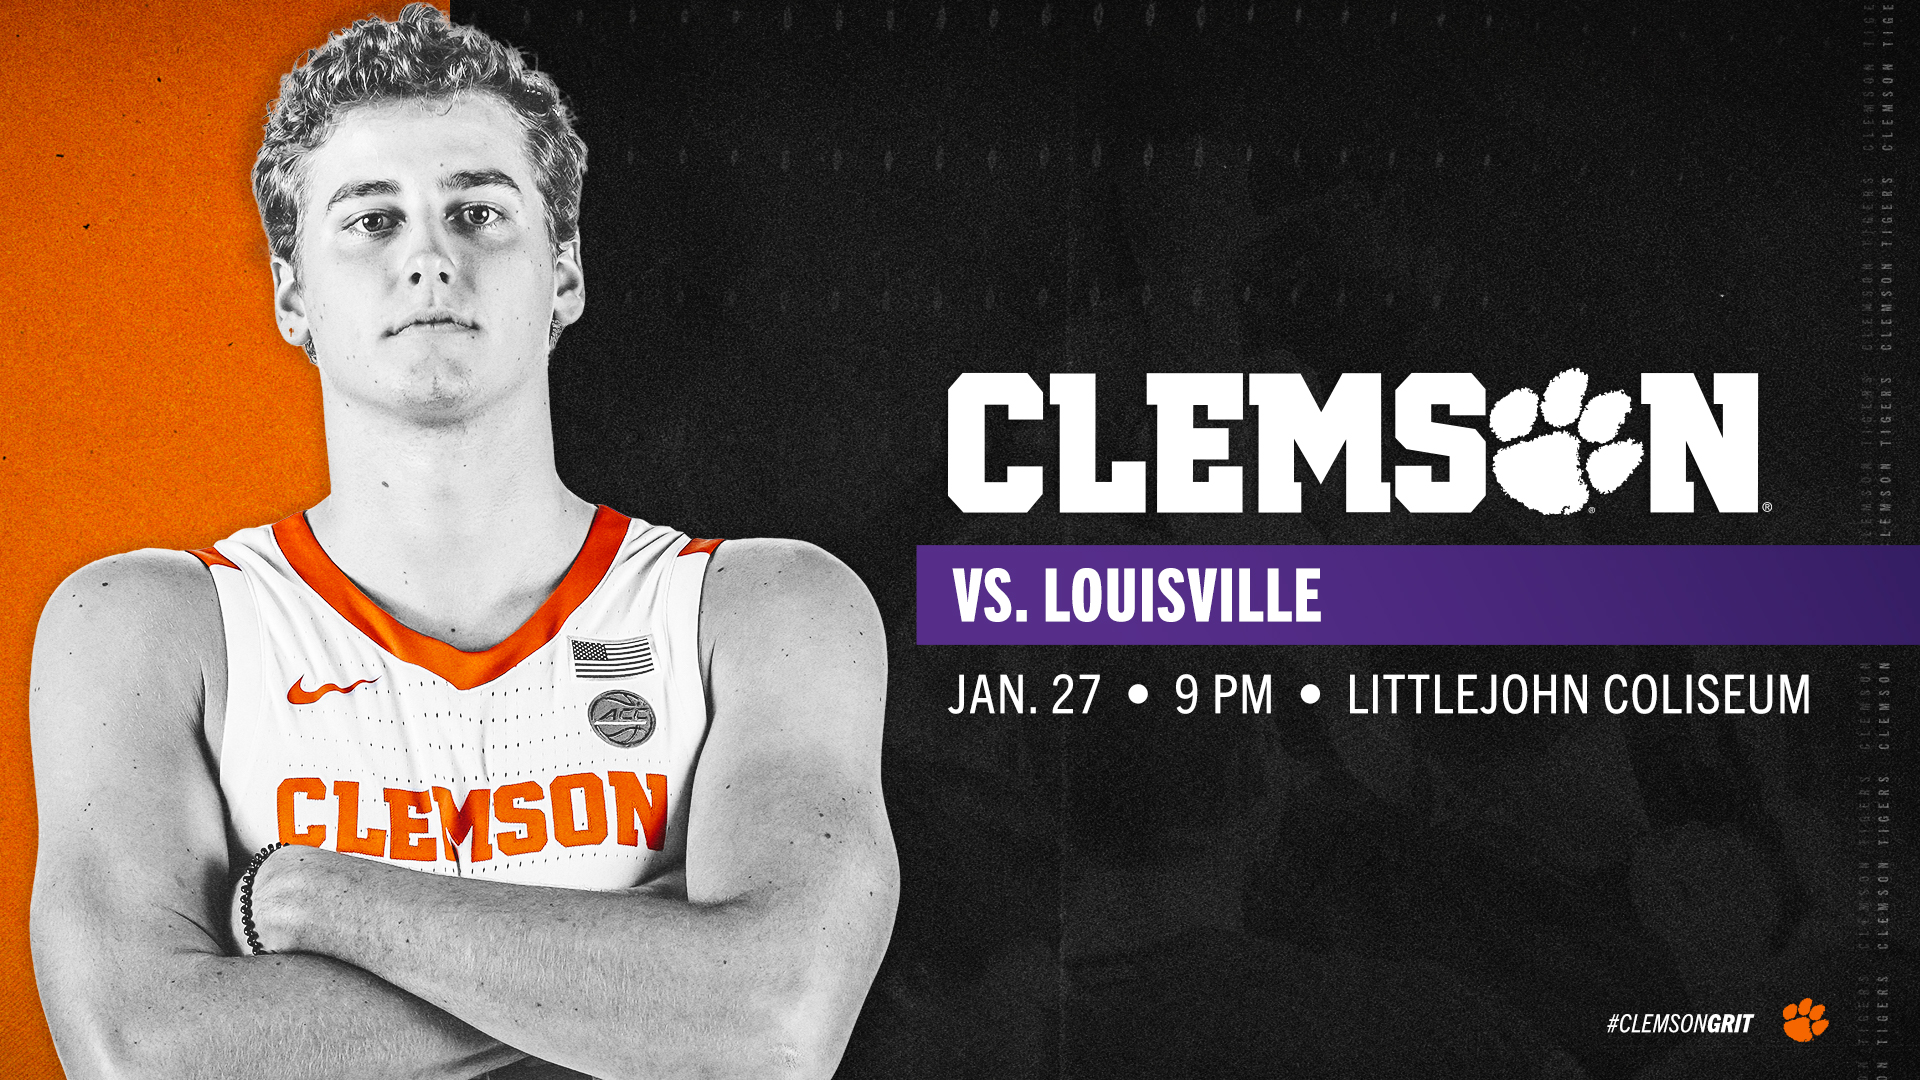 Gameday Guide: Clemson vs. Louisville (January 27, 2021)